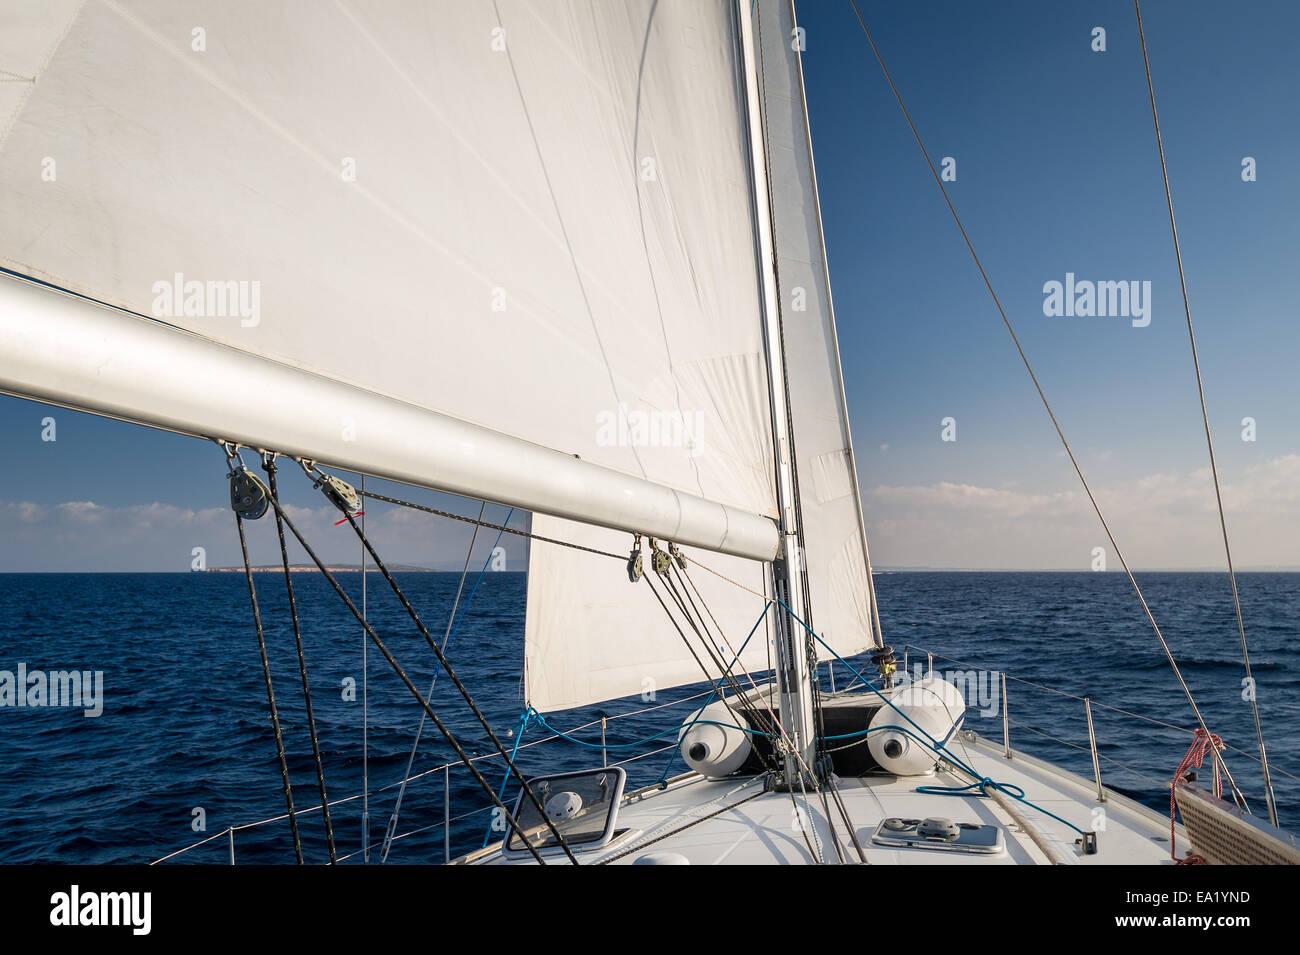 Sailing in Mediterranean sea - Stock Image